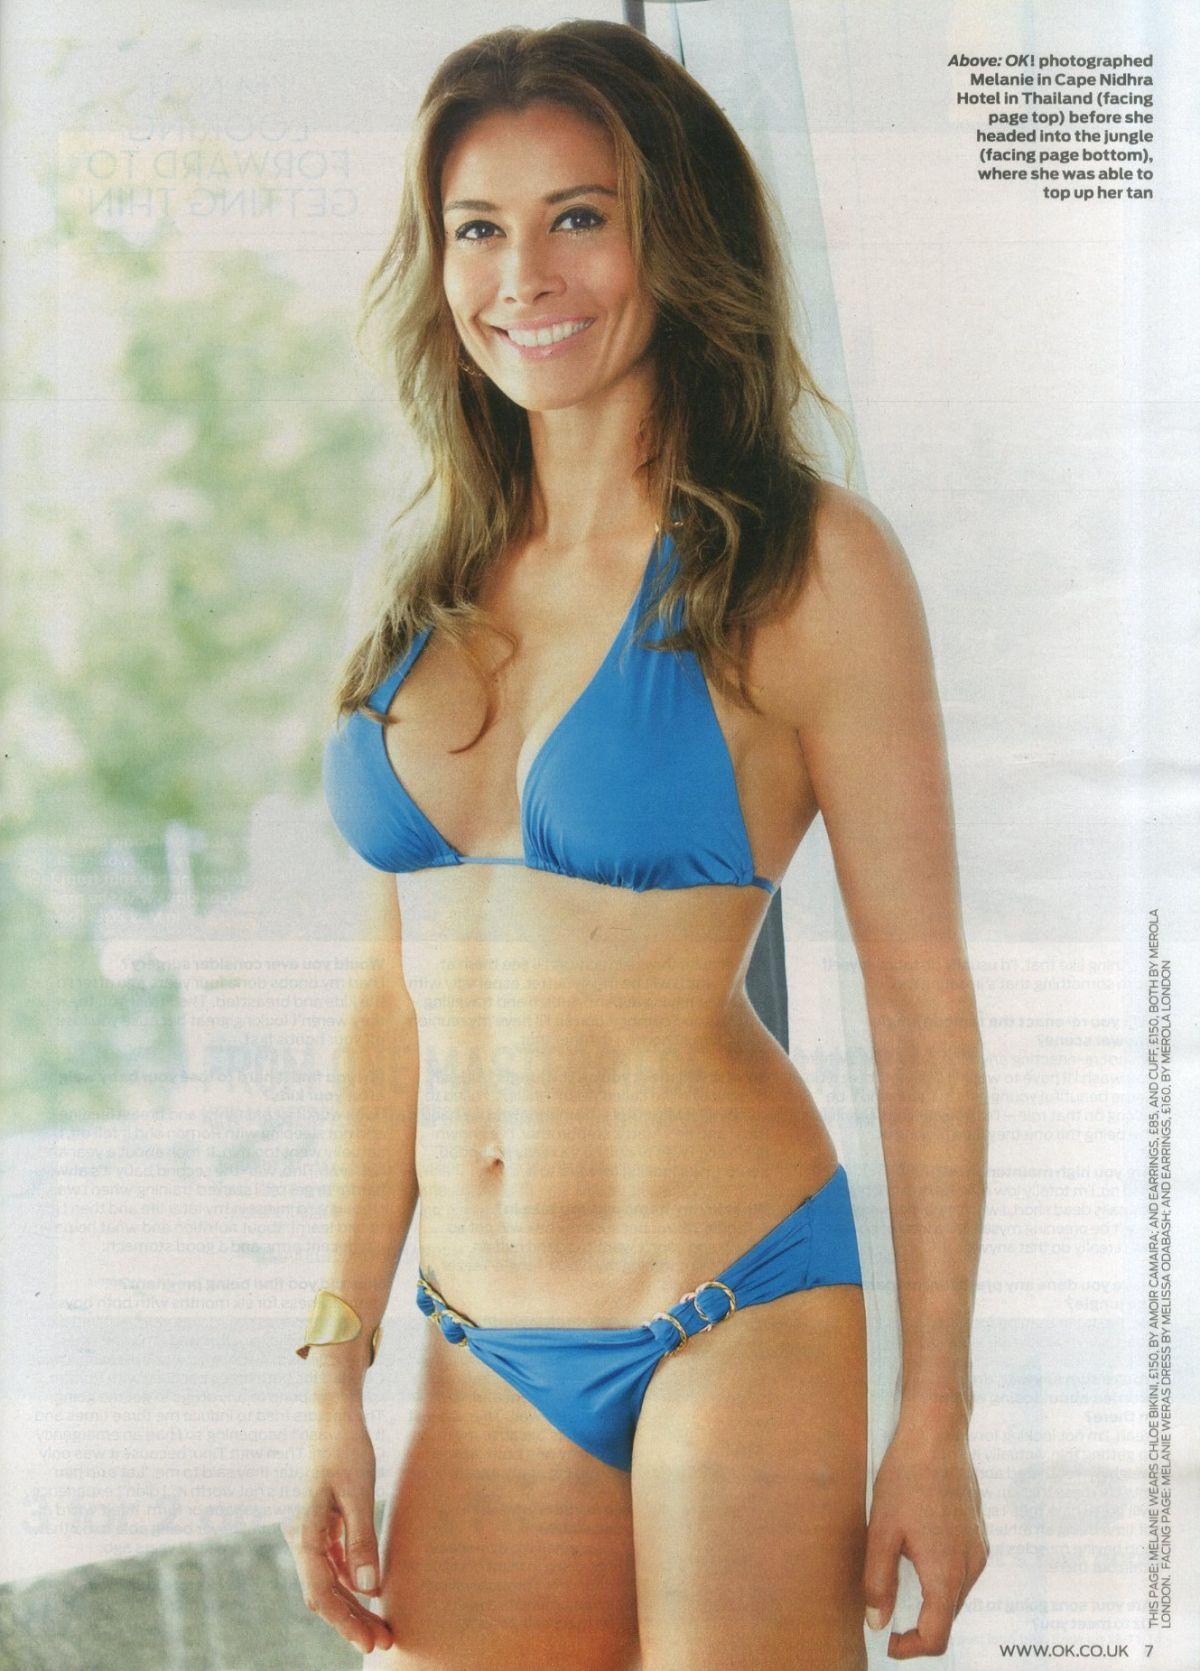 MELANIE SYKES in OK Magazine